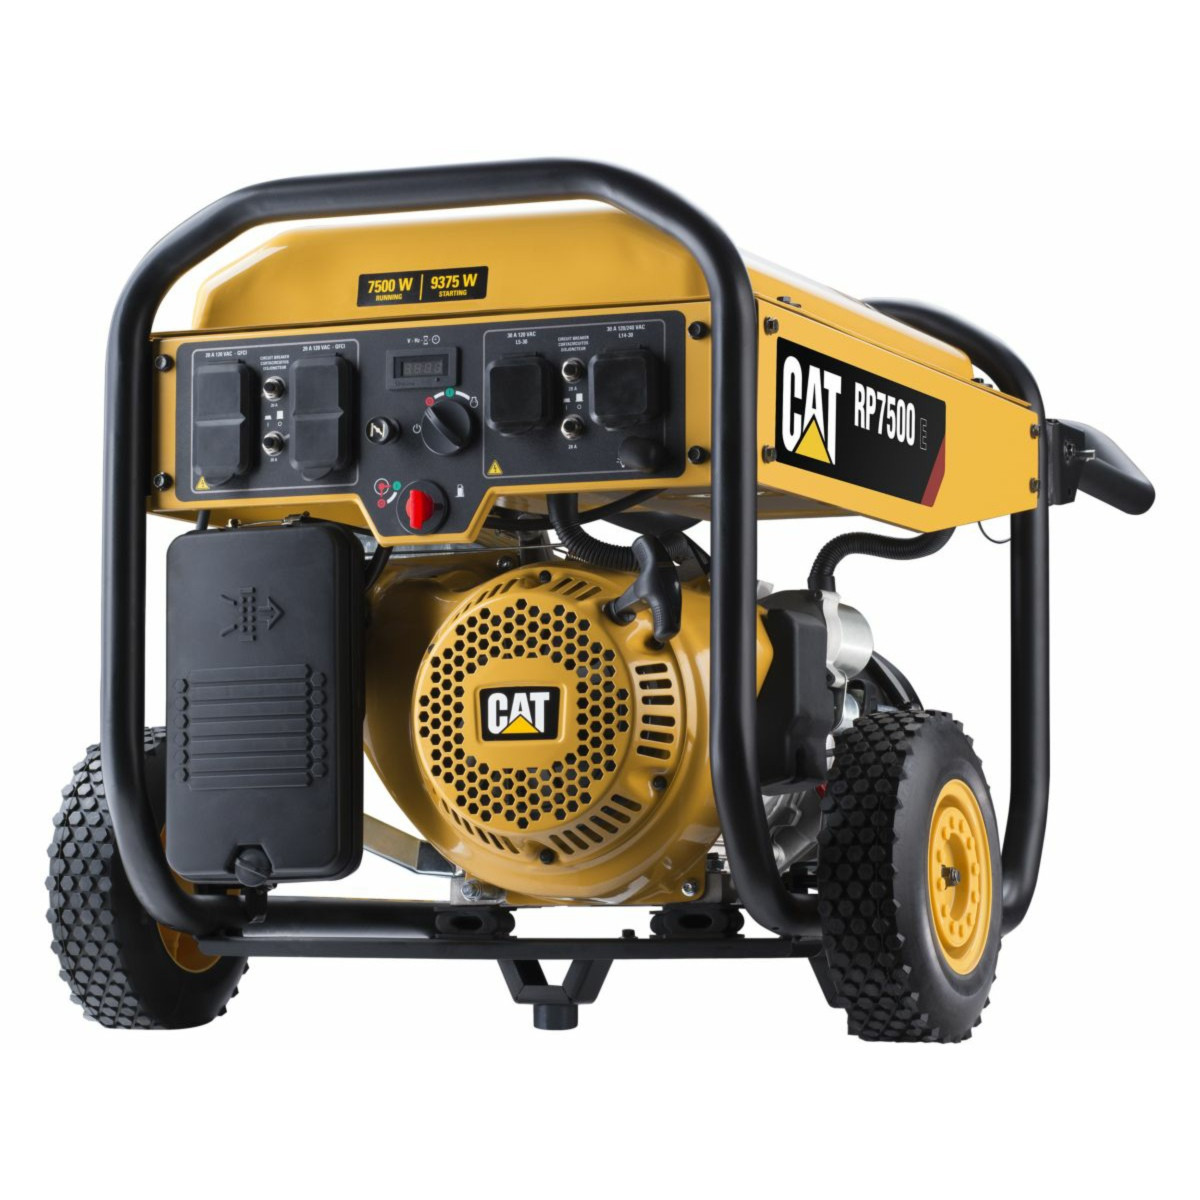 CAT RP7500E 7500W Electric Start Portable Generator